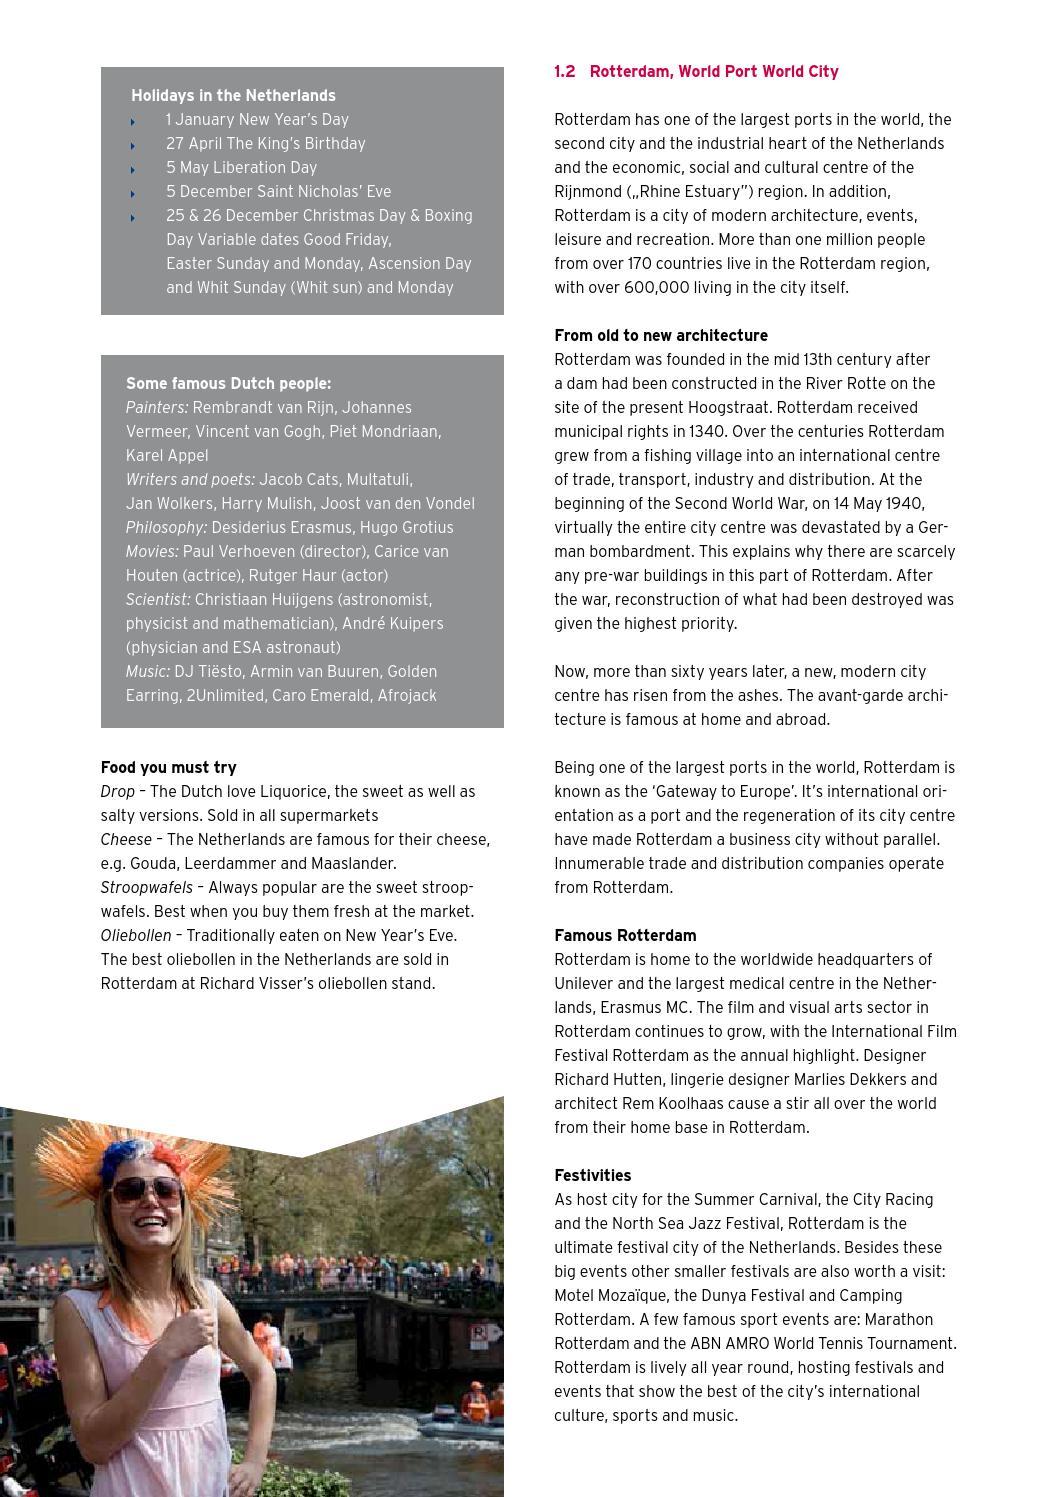 Handbook for international students by Hogeschool Rotterdam